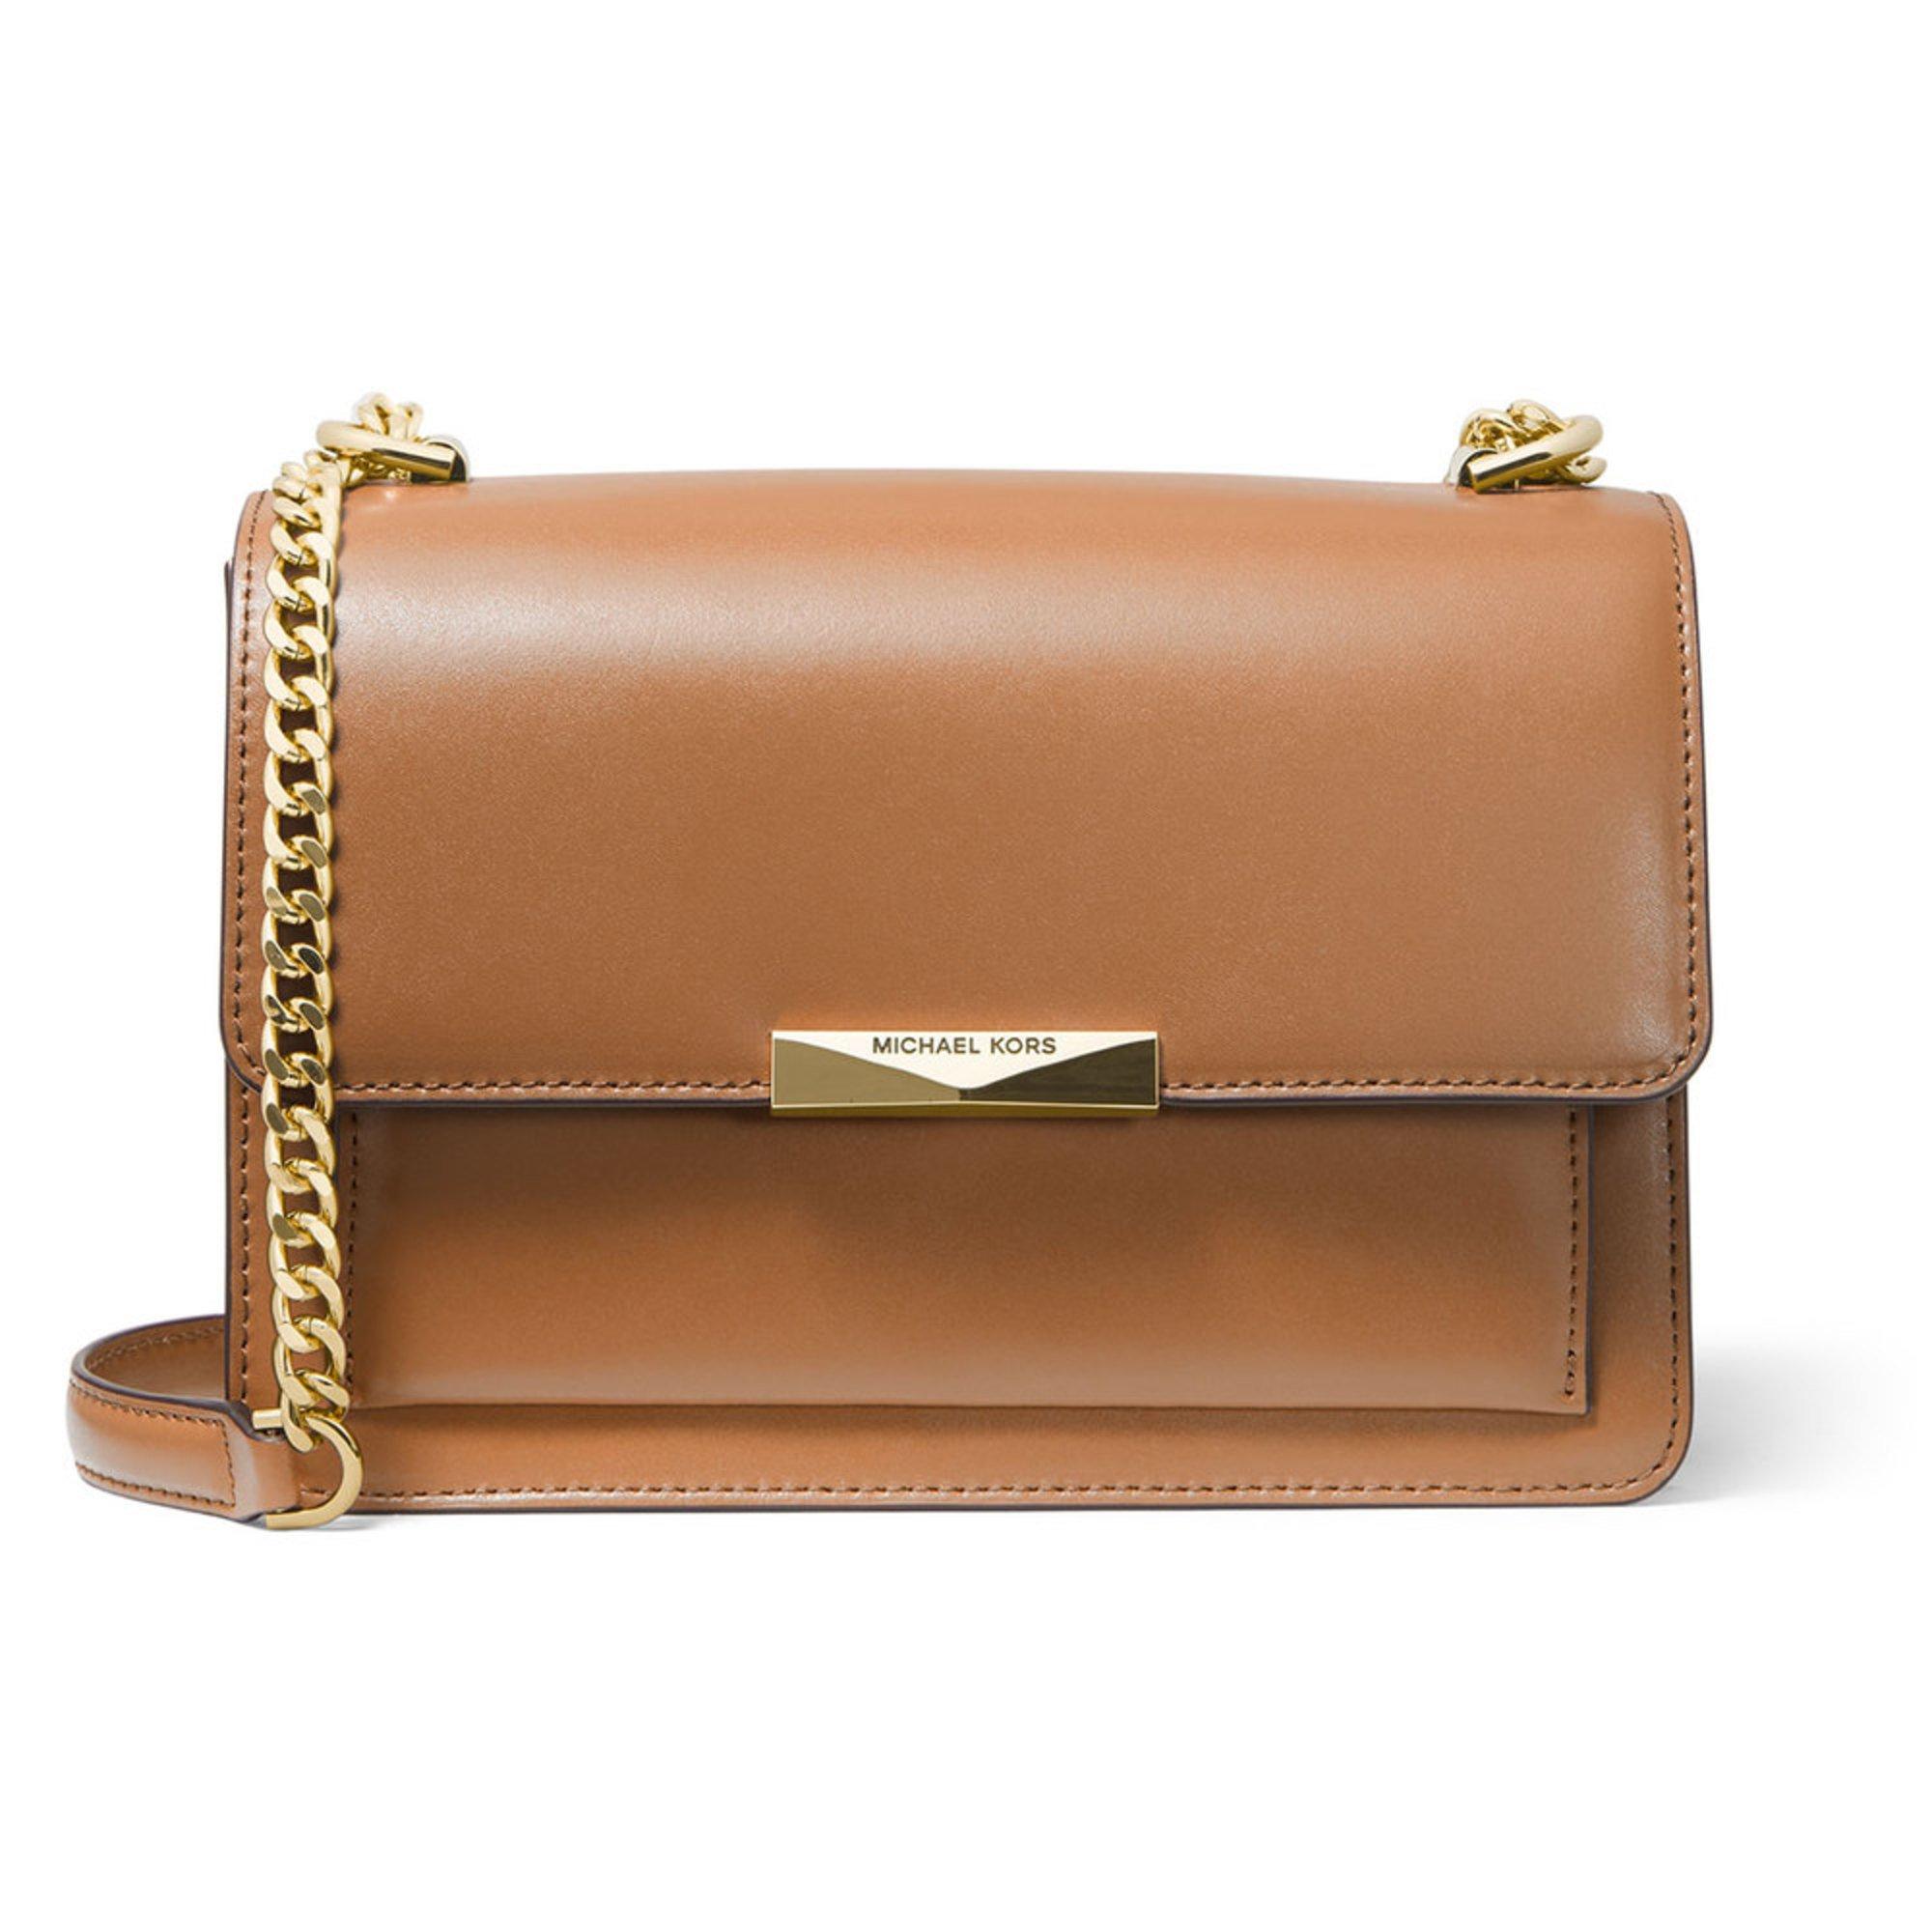 ed43925f87fc Michael Kors Jade Large Gusset Shoulder Black   Shoulder Bags   Accessories  - Shop Your Navy Exchange - Official Site